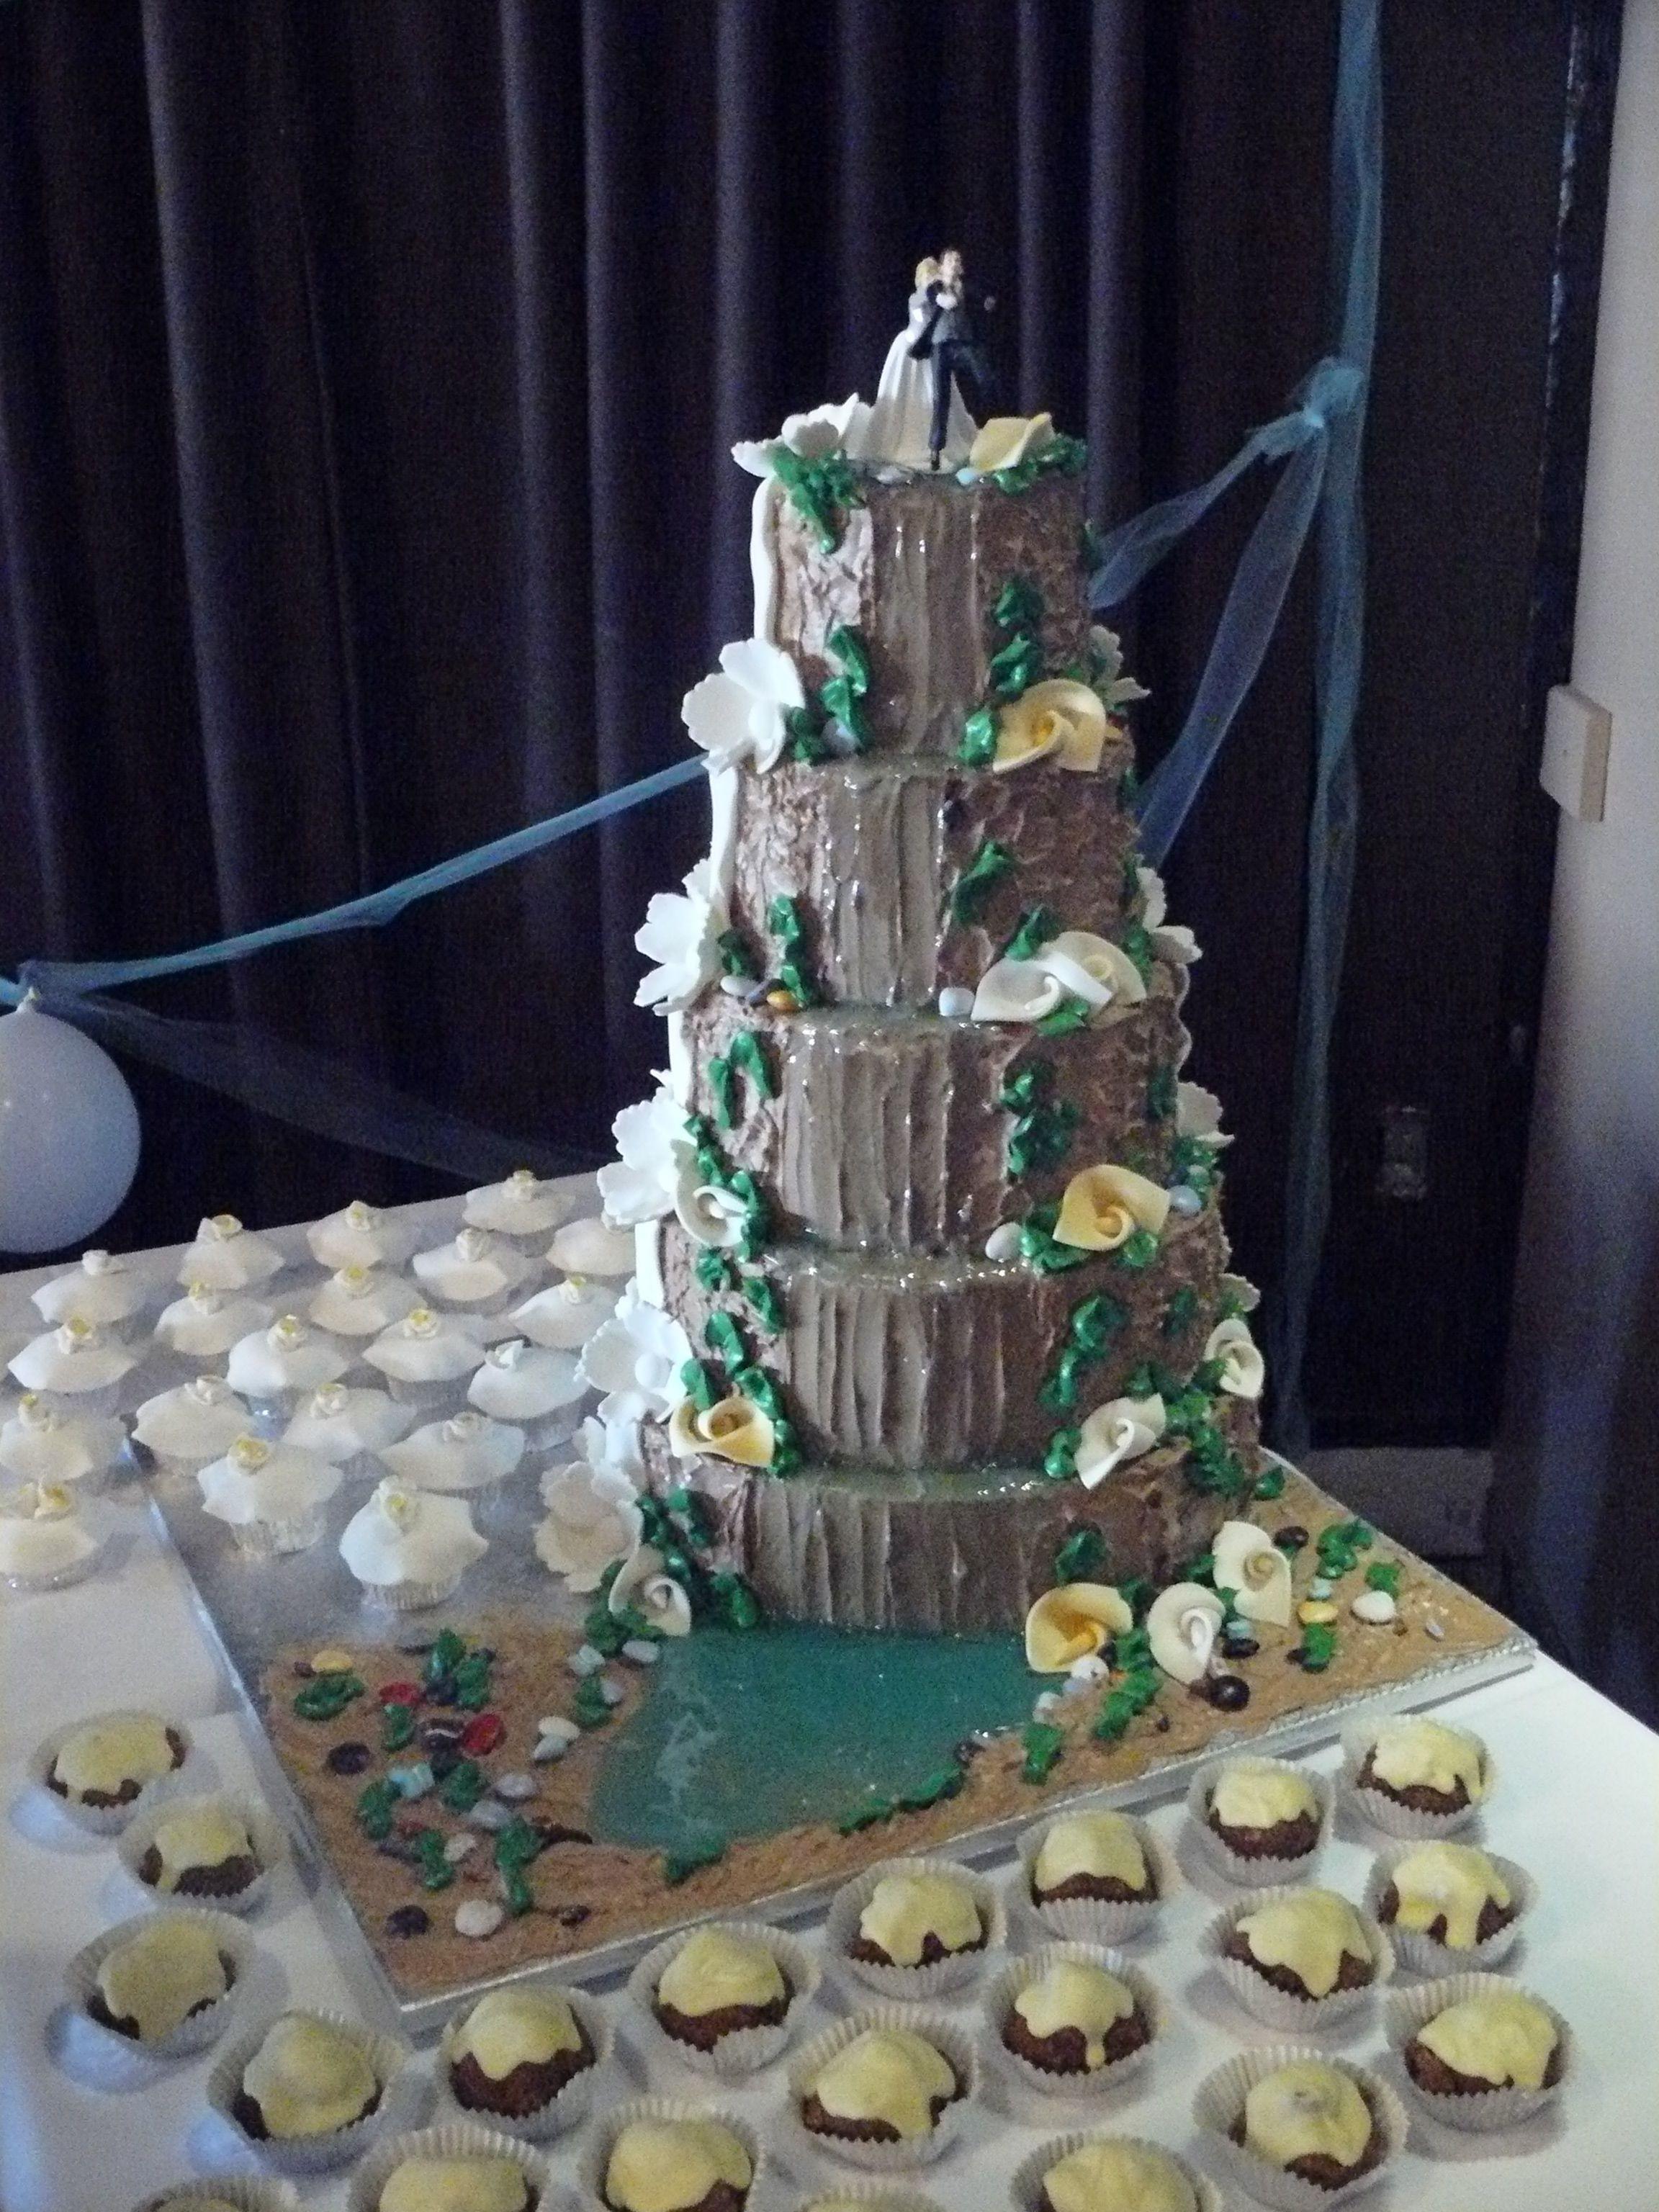 Waterfall Wedding Cakes  1 2 & 1 2 waterfall cake wedding